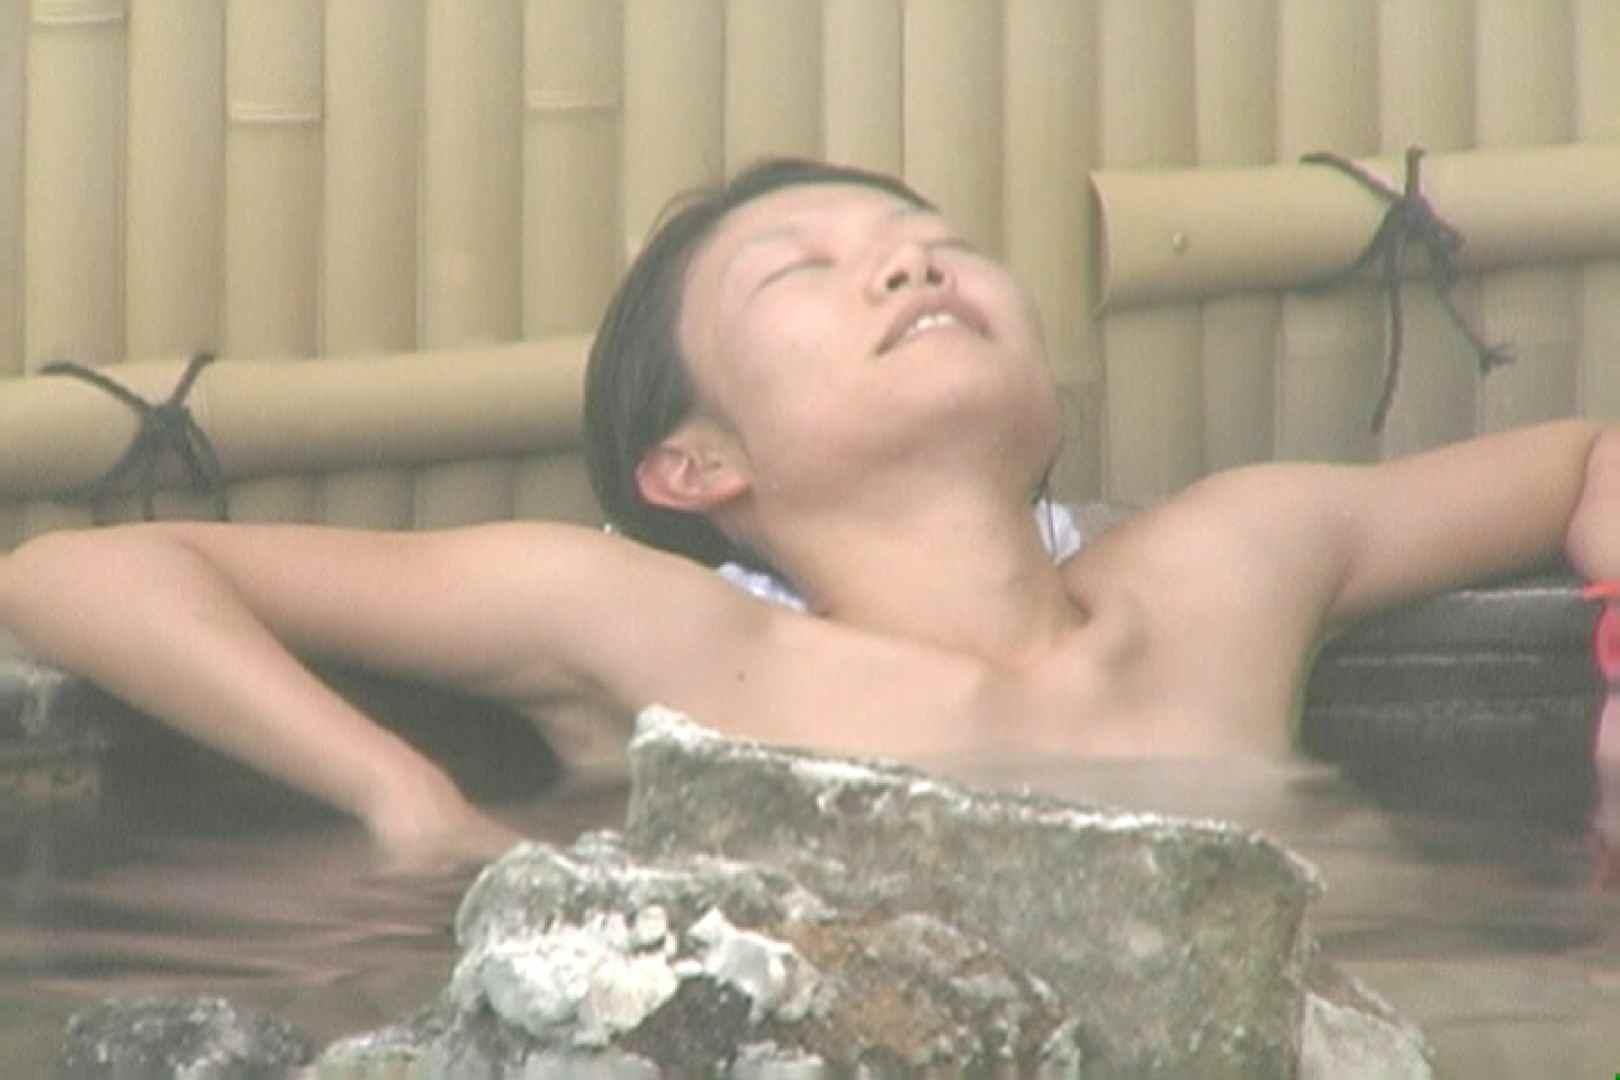 Aquaな露天風呂Vol.626 OLセックス | 盗撮  92画像 22